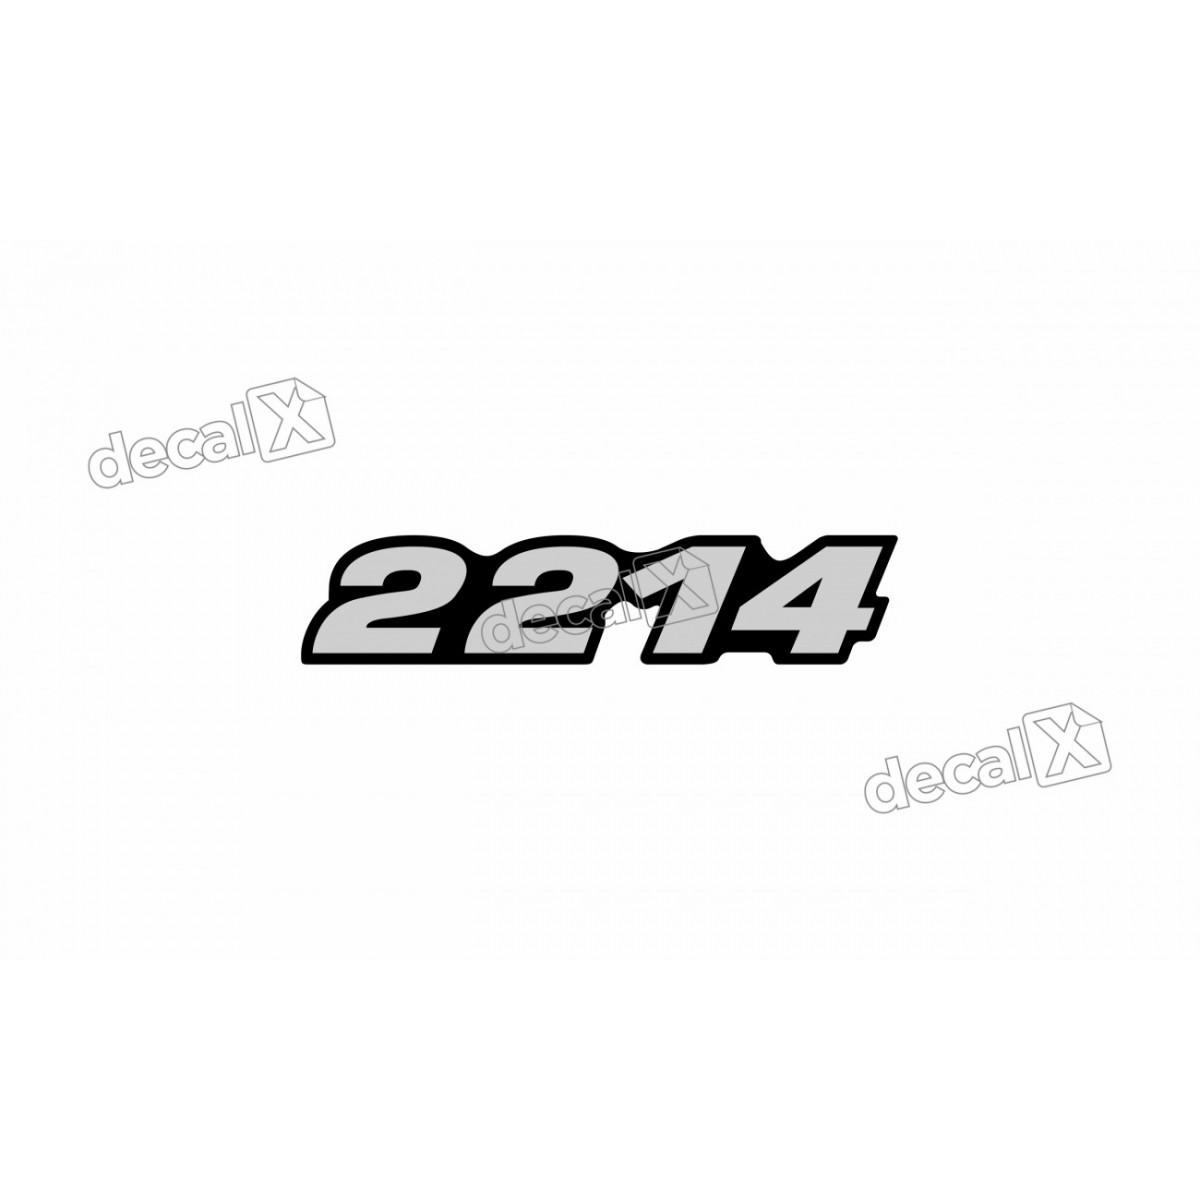 Adesivo Emblema Resinado Mercedes 2214 Cm78 Decalx